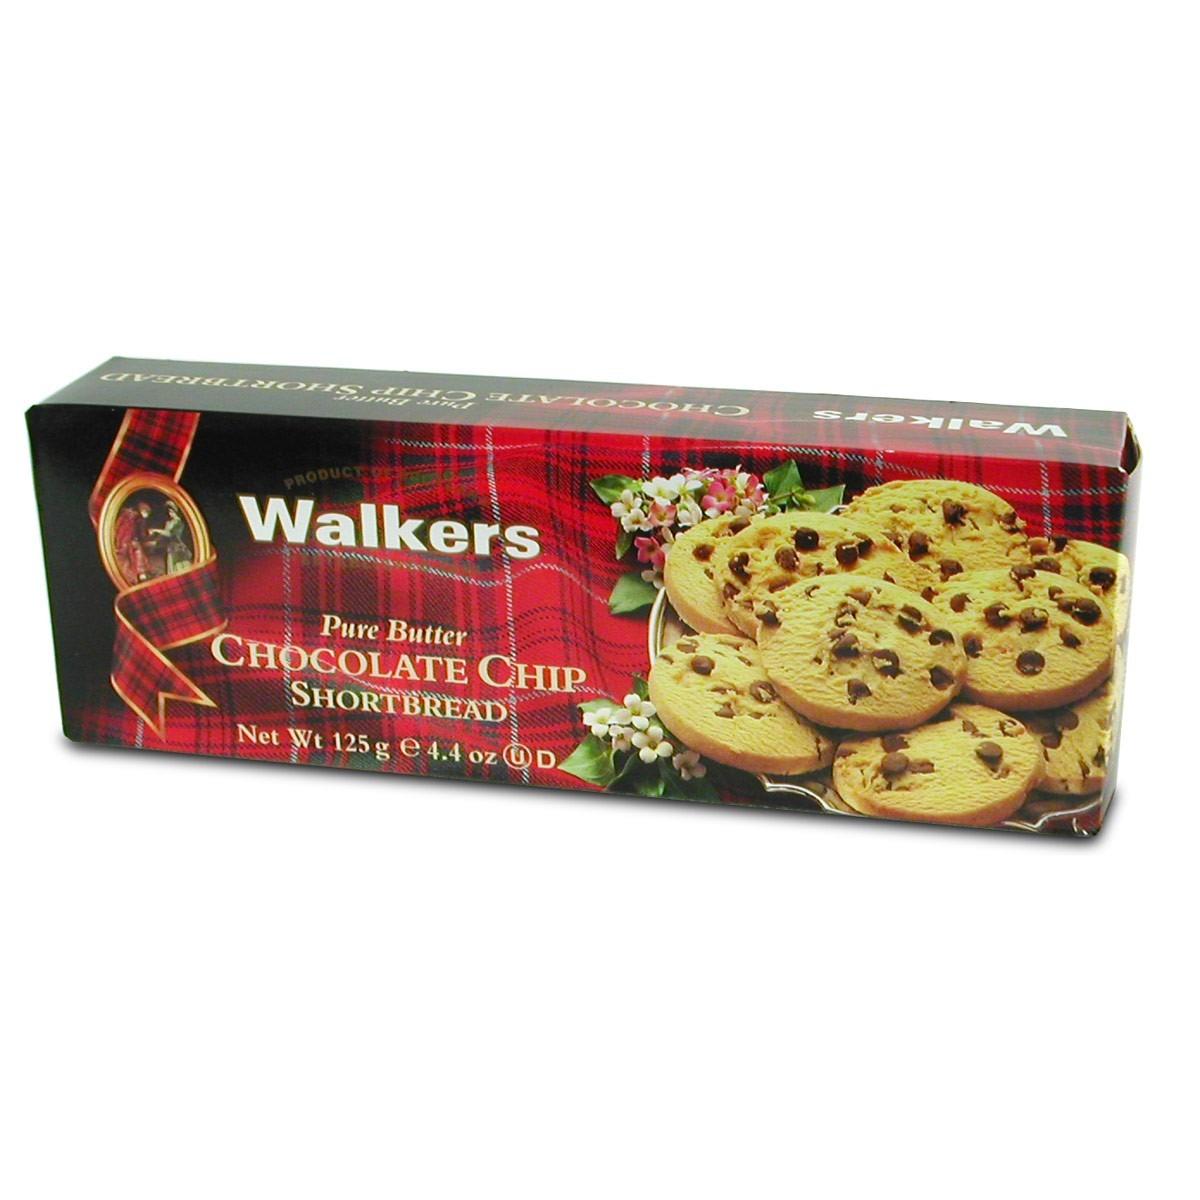 Walker Chocolate Chip Shortbread 4 4 Oz